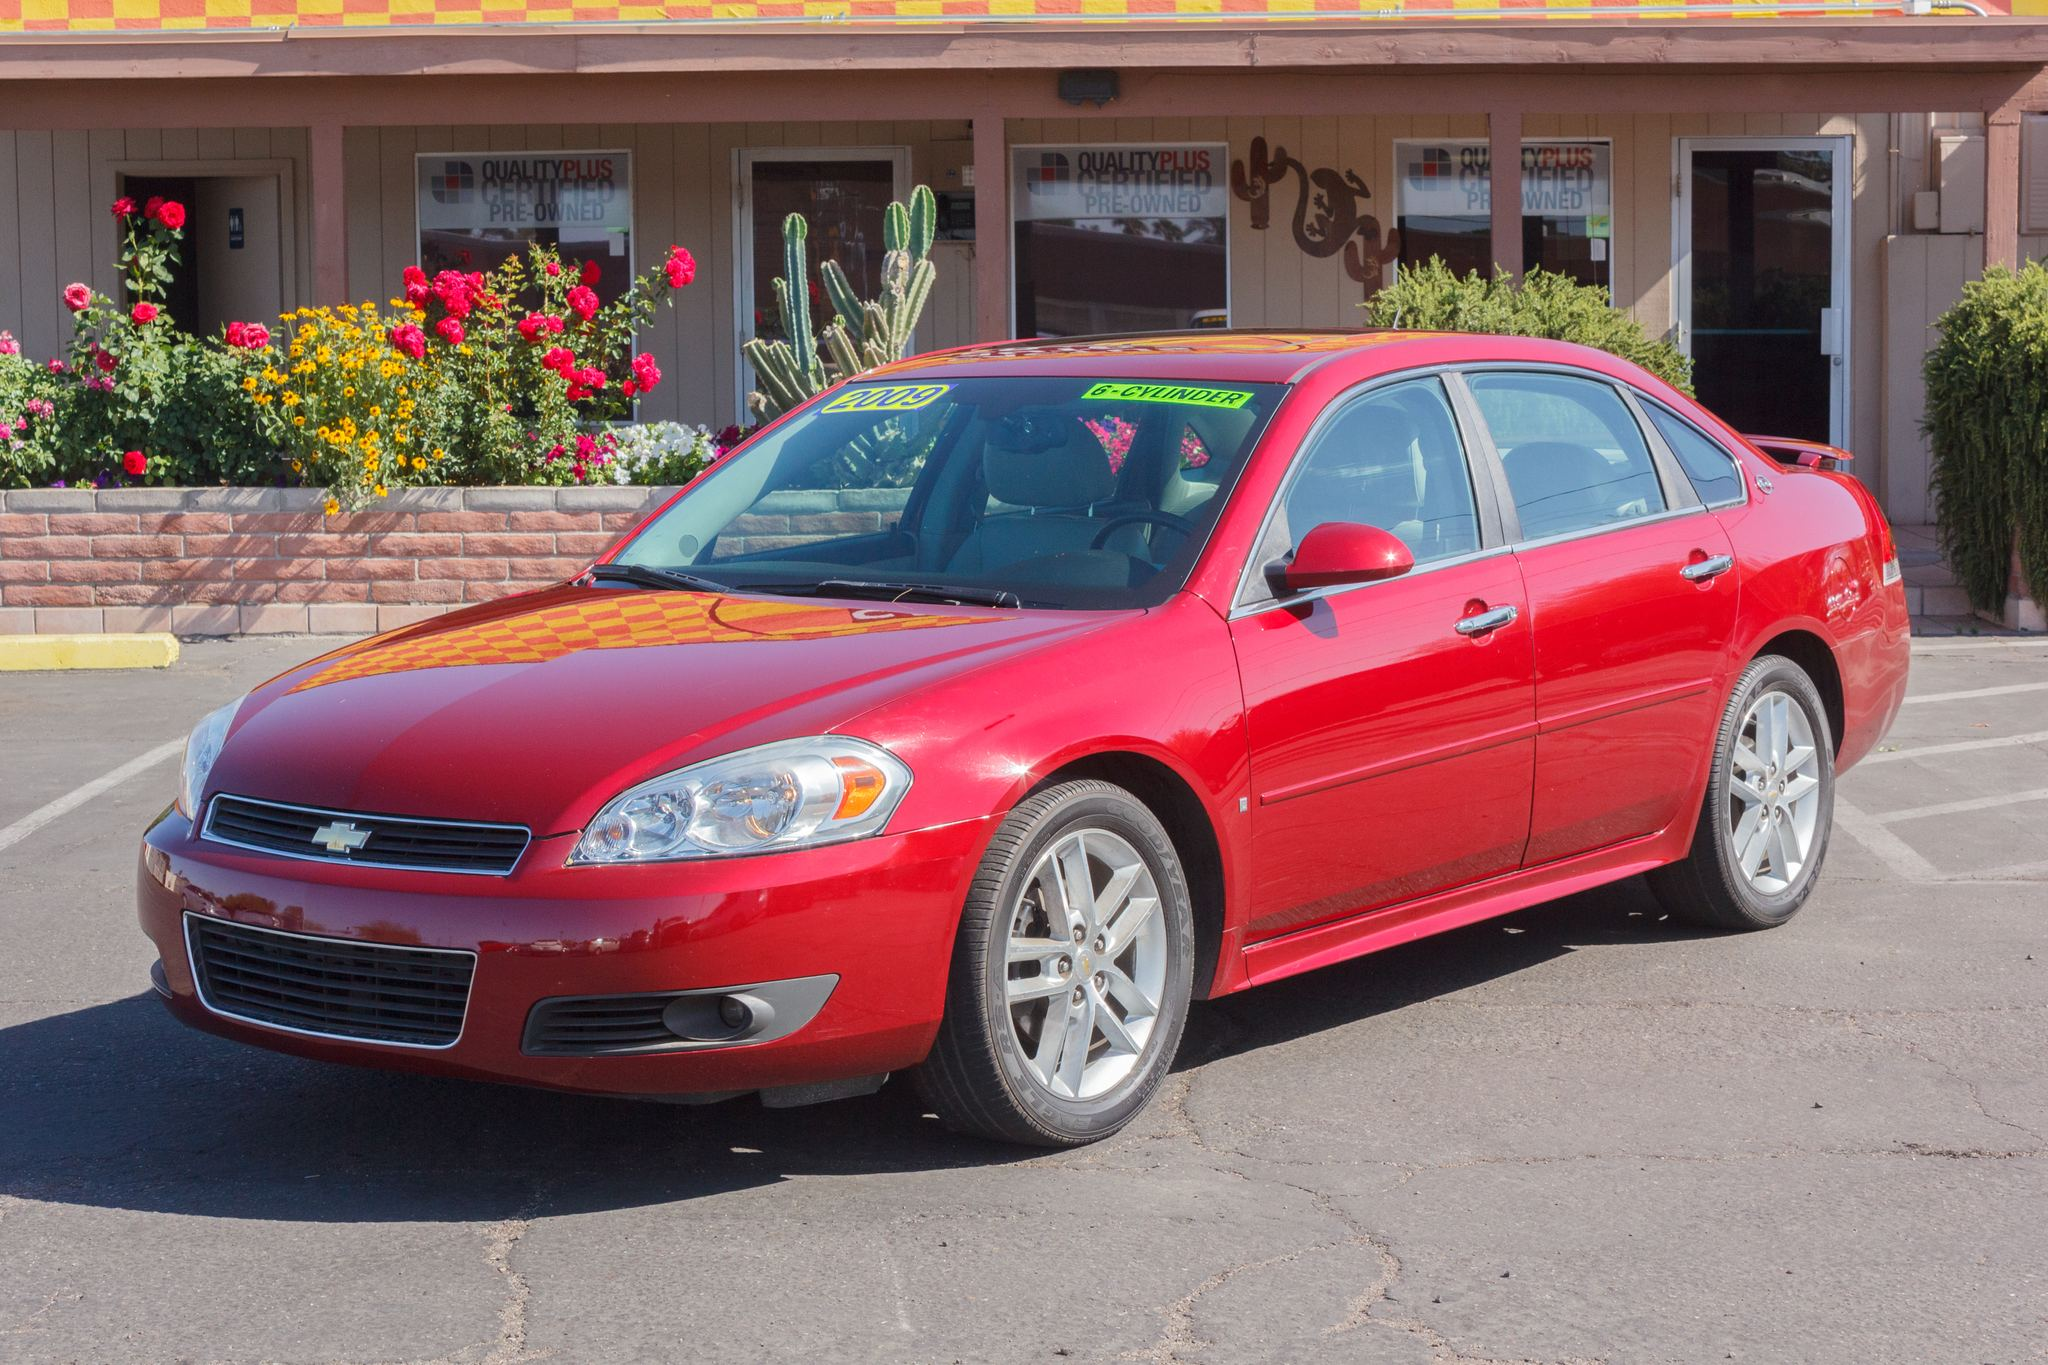 Photo of 2009 Chevrolet Impala 4d Sedan LTZ Red Jewel Tintcoat